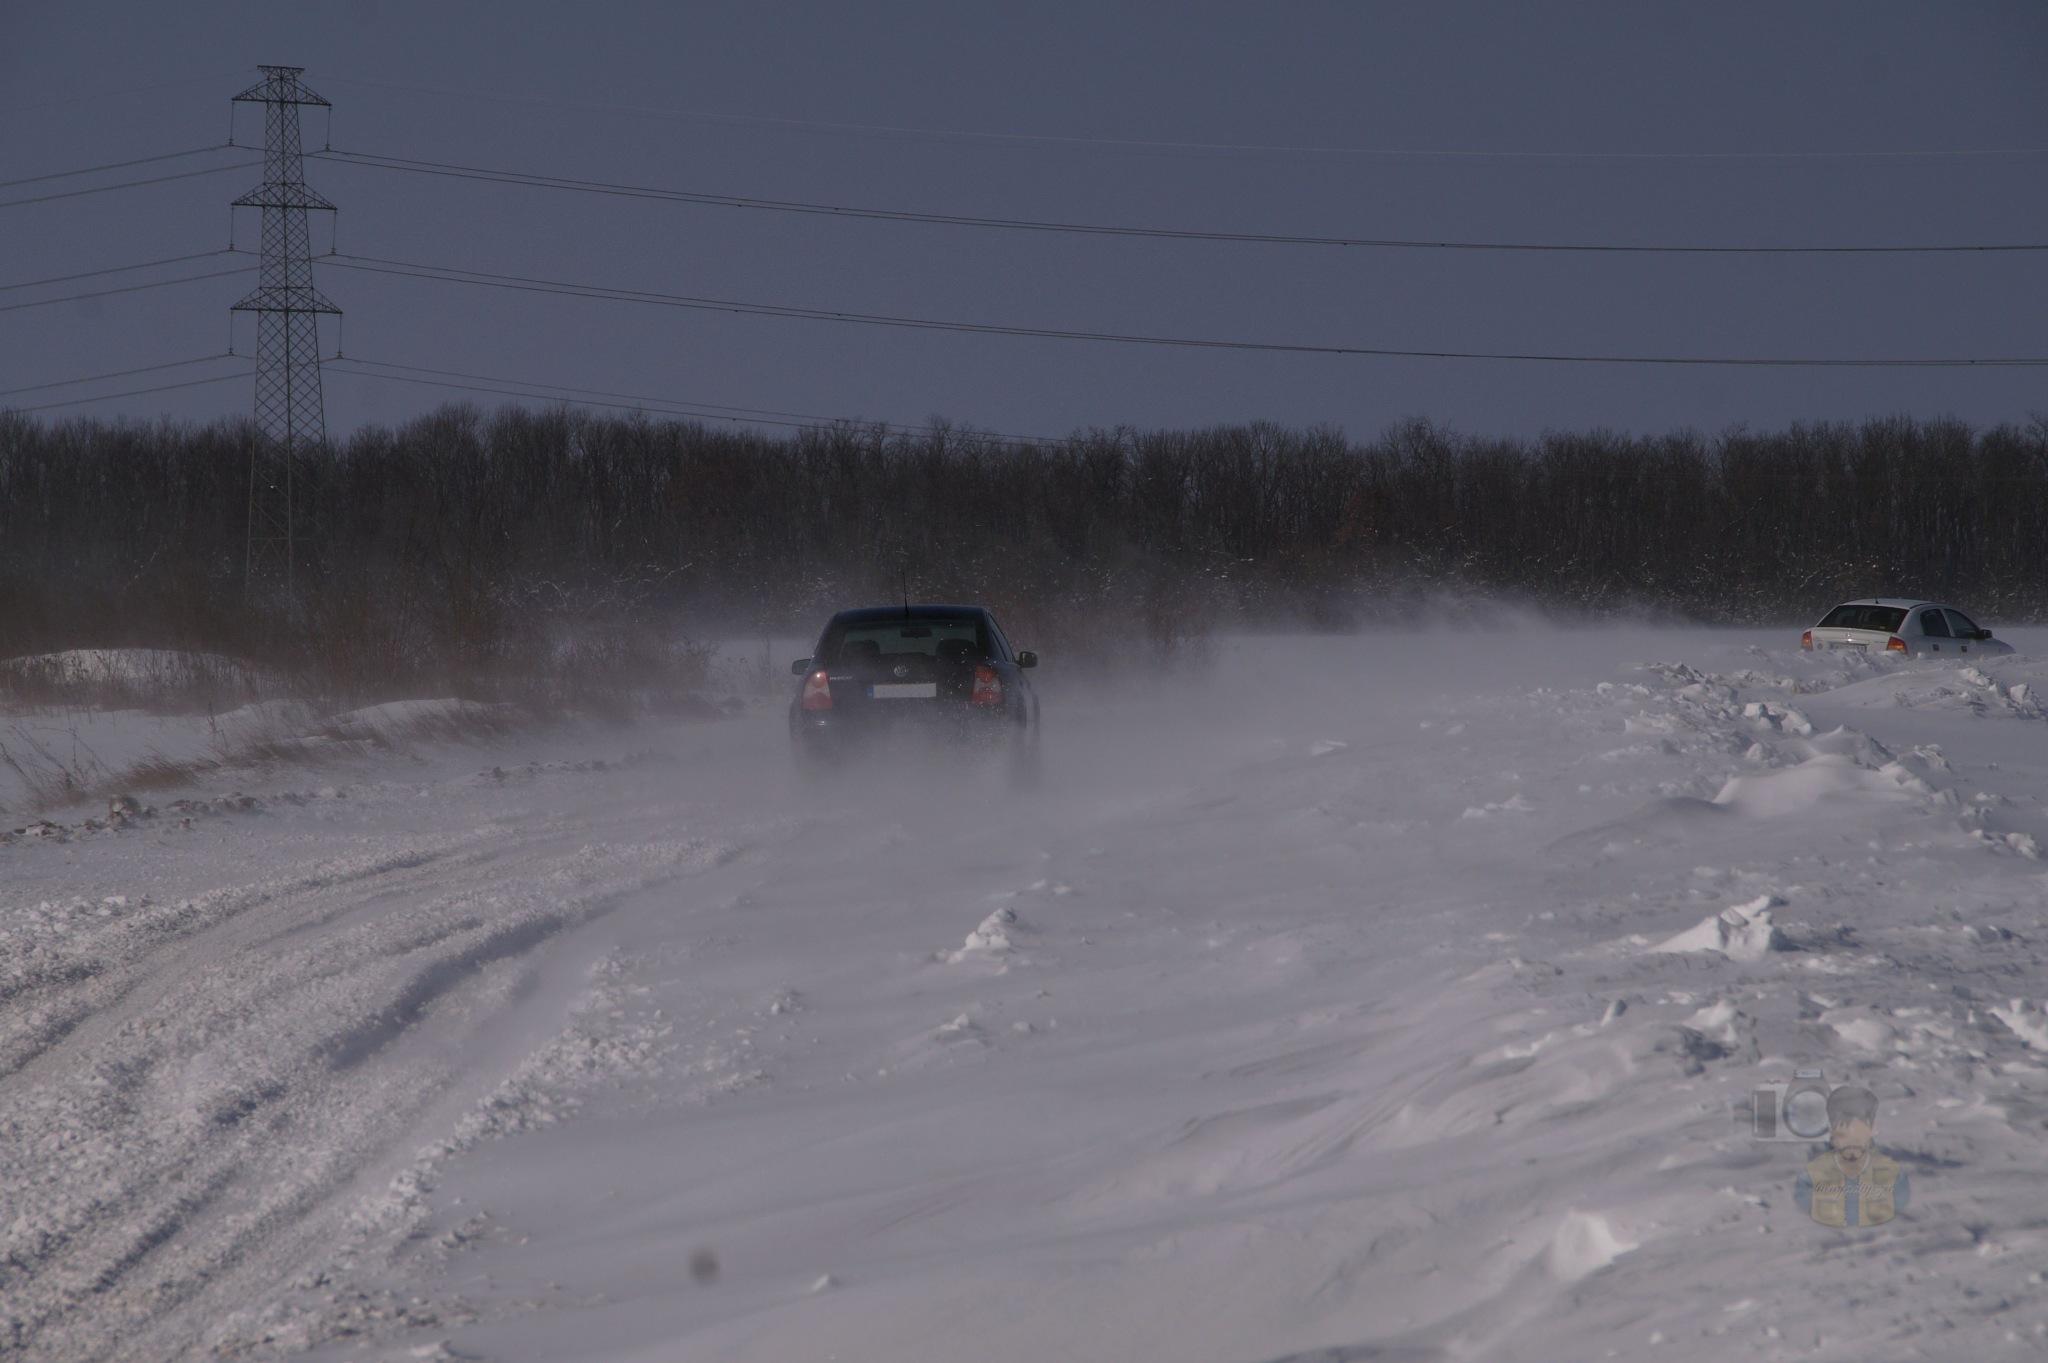 Febr.24, snowdrift on road #2 by hunyadigeza